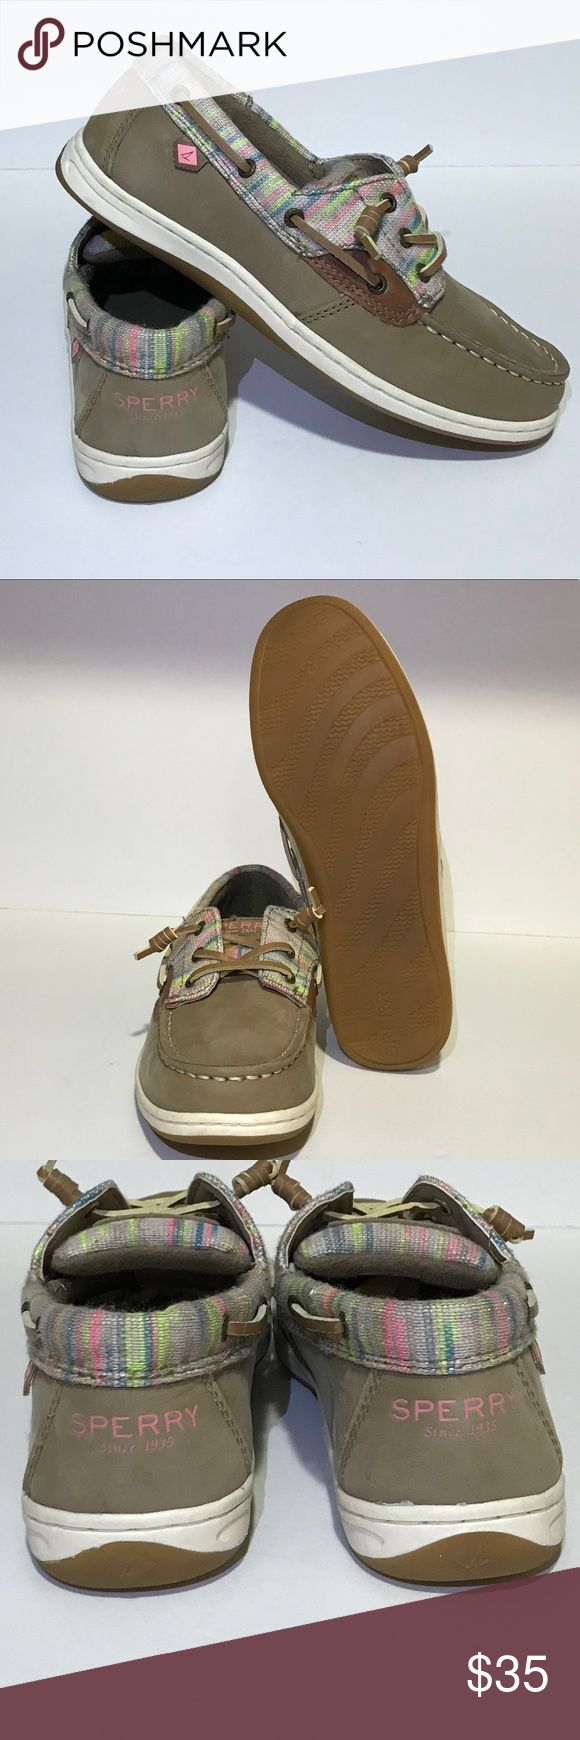 best 25+ moccasins for kids ideas on pinterest | bb shoes, felt